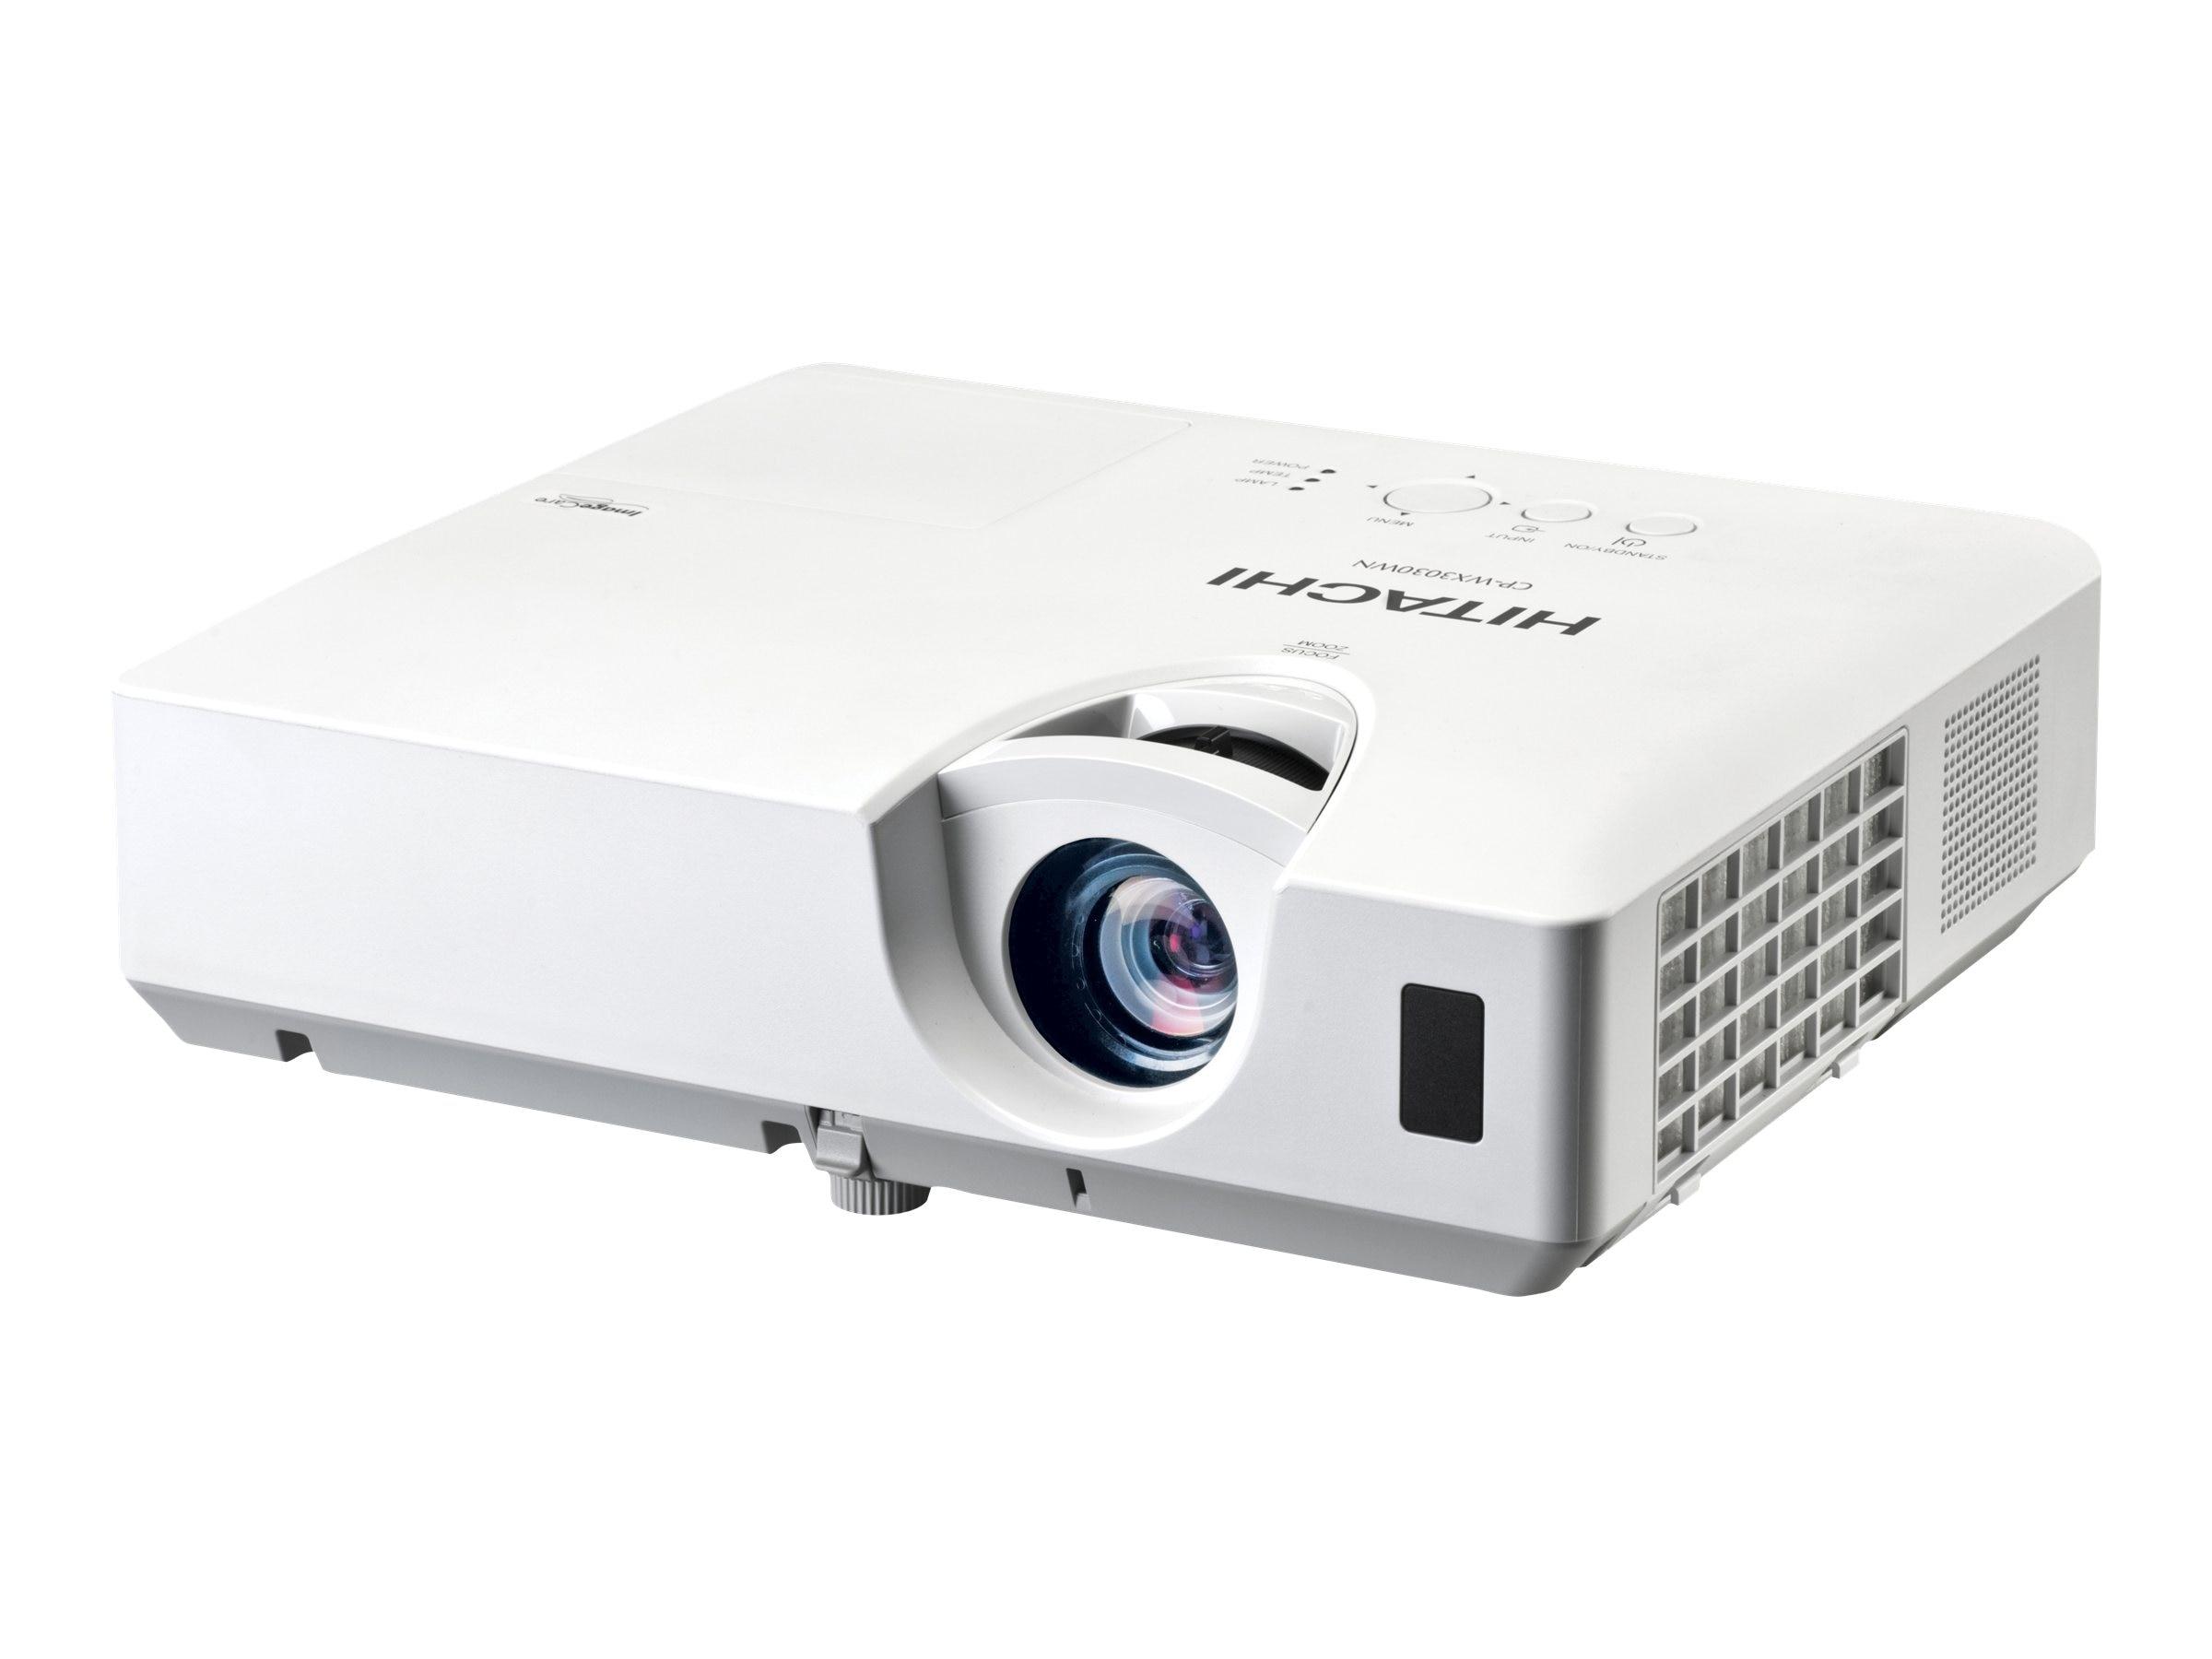 Hitachi CPWX3030WN Image 1